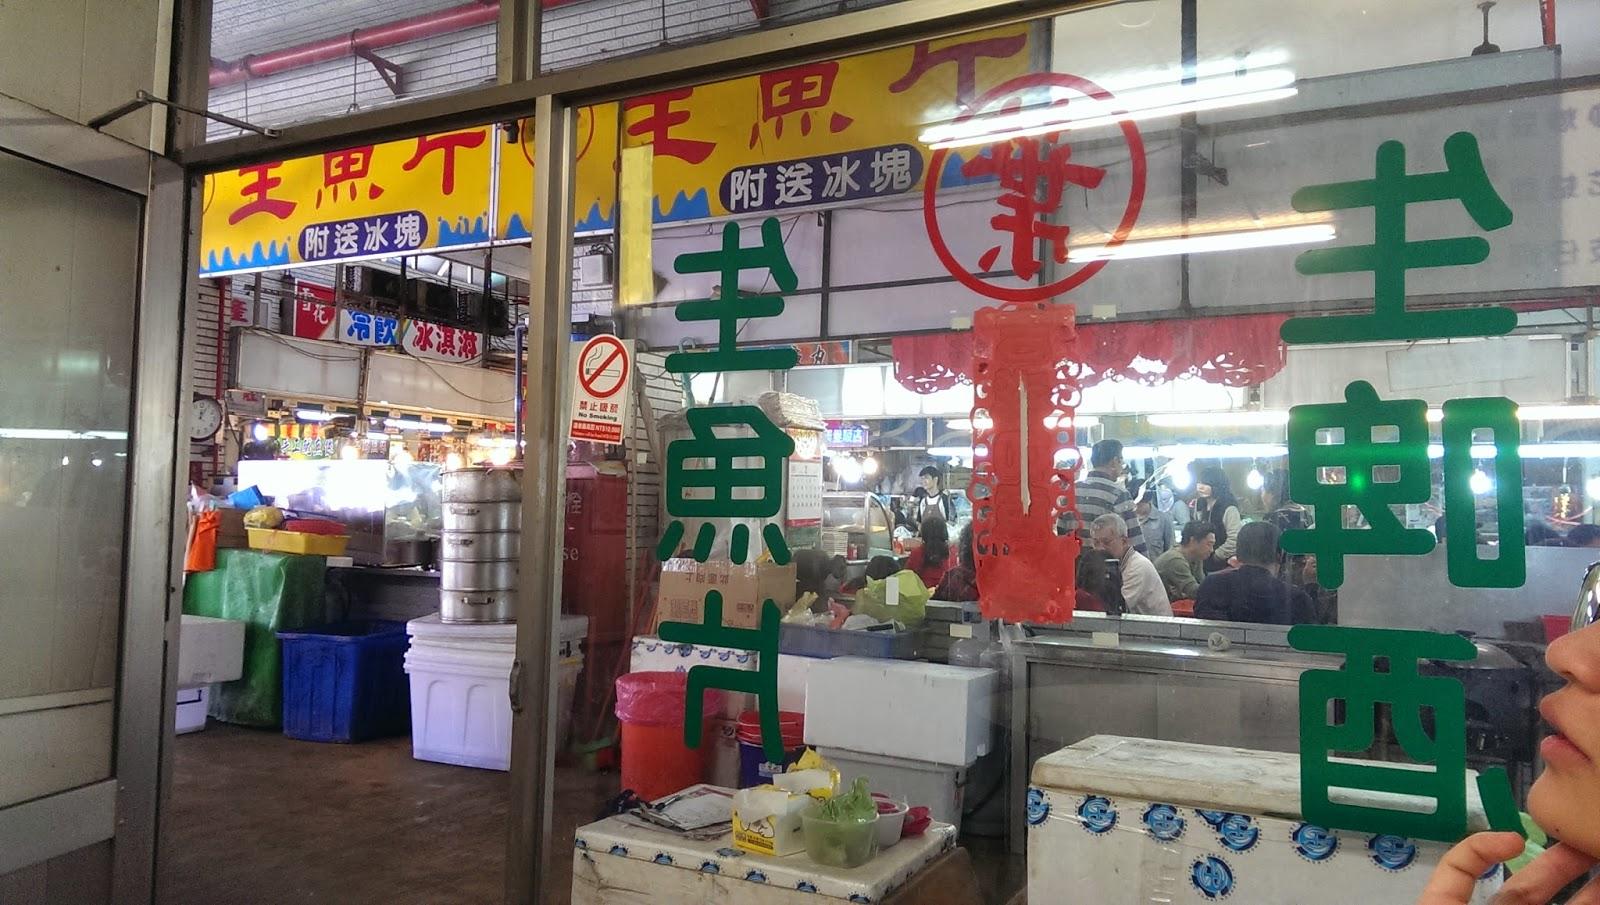 2015 02 02%2B12.02.54 - [食記] 葉家生魚片 - 布袋觀光漁市中的鮮魚餐廳